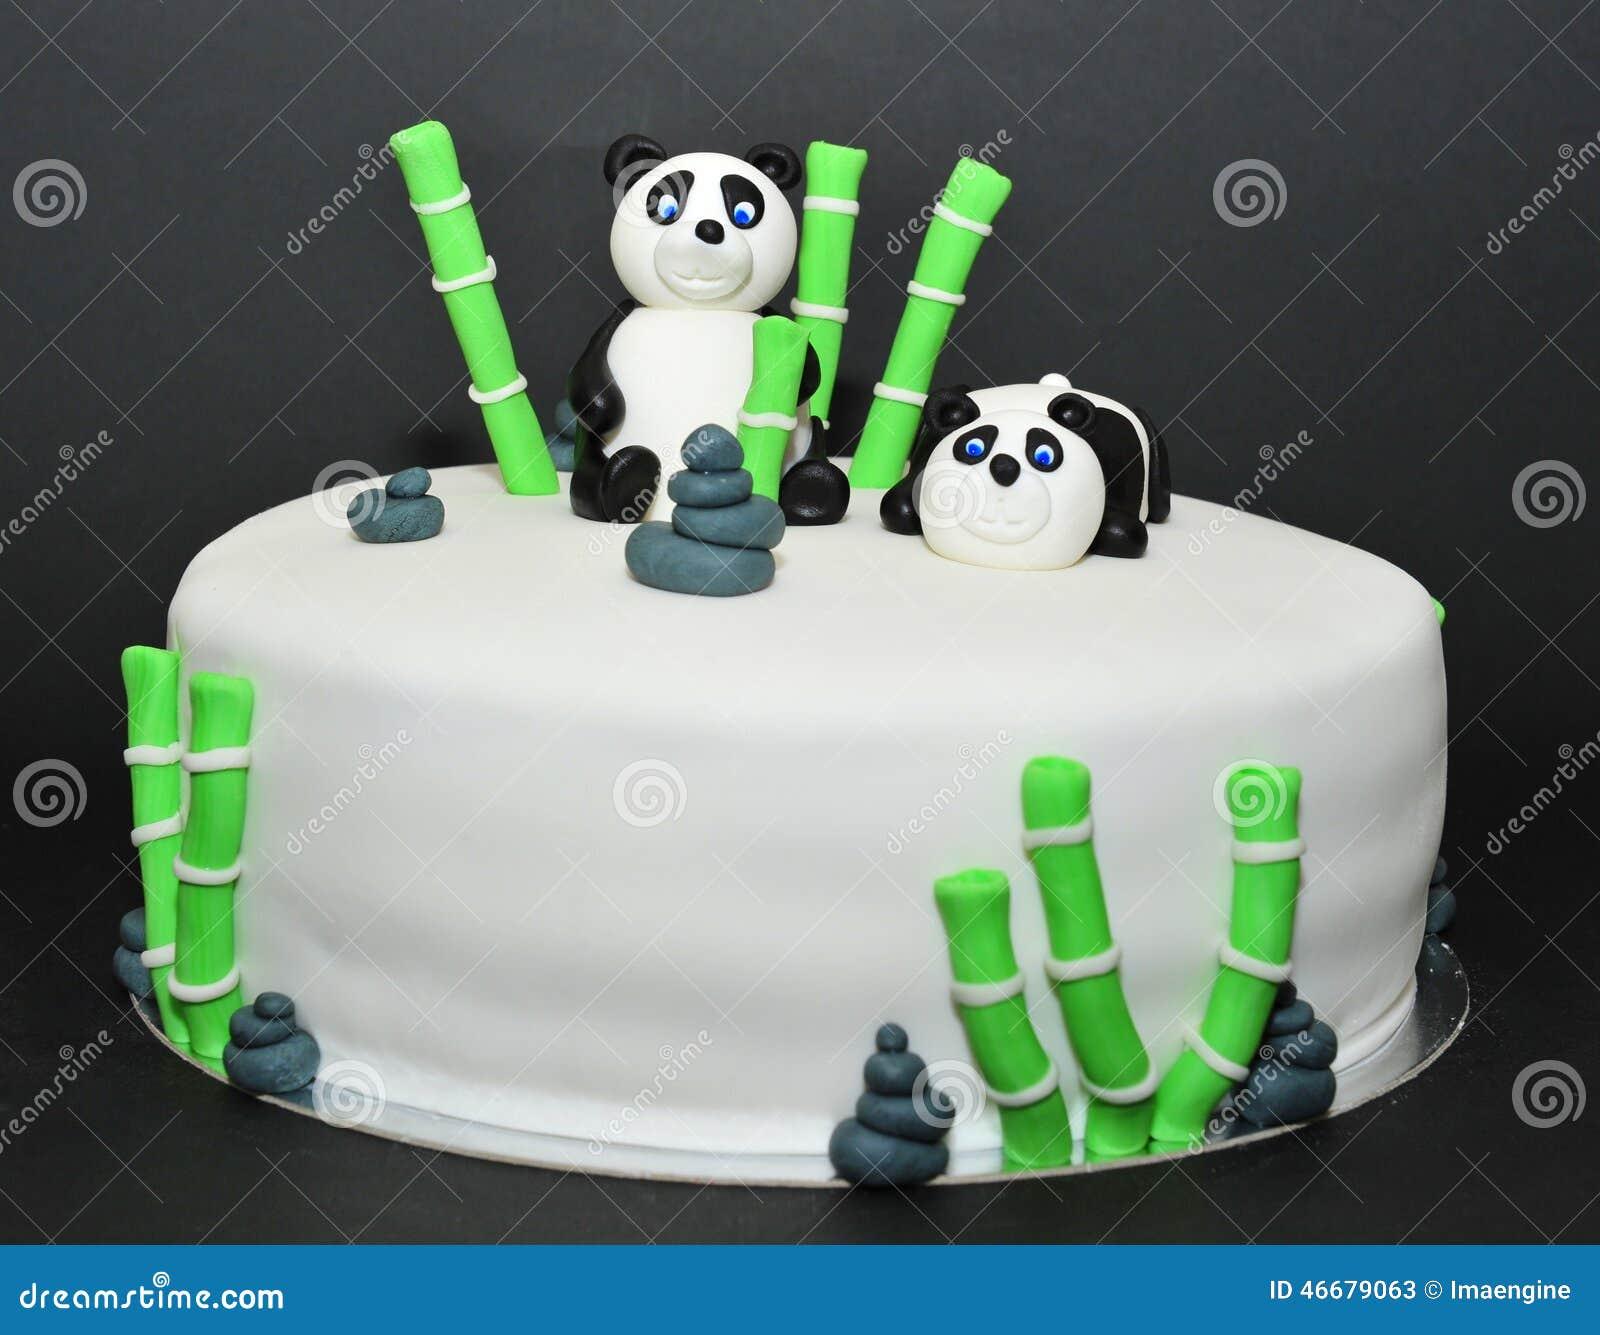 Strange Panda Bears Fondant Birthday Cake Stock Image Image Of Garden Funny Birthday Cards Online Inifofree Goldxyz